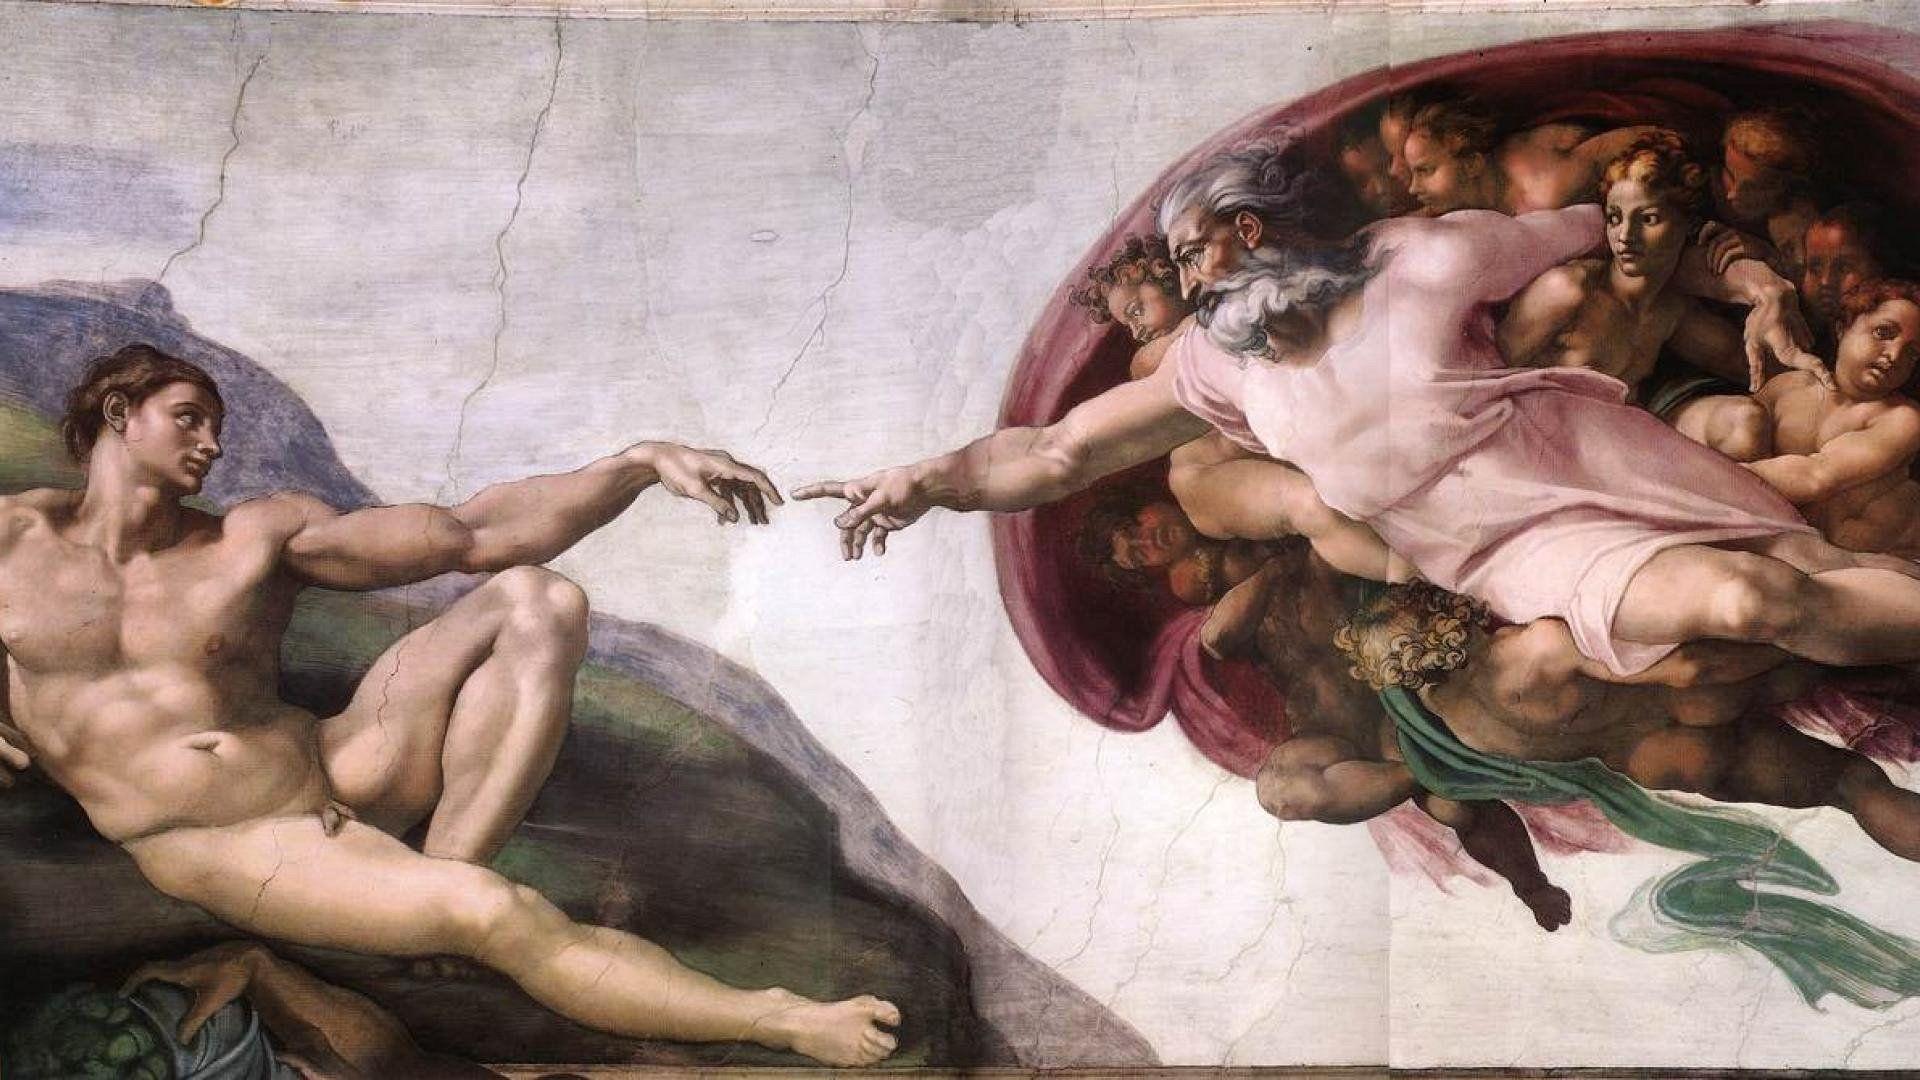 Michelangelo Paintings Wallpapers Top Free Michelangelo